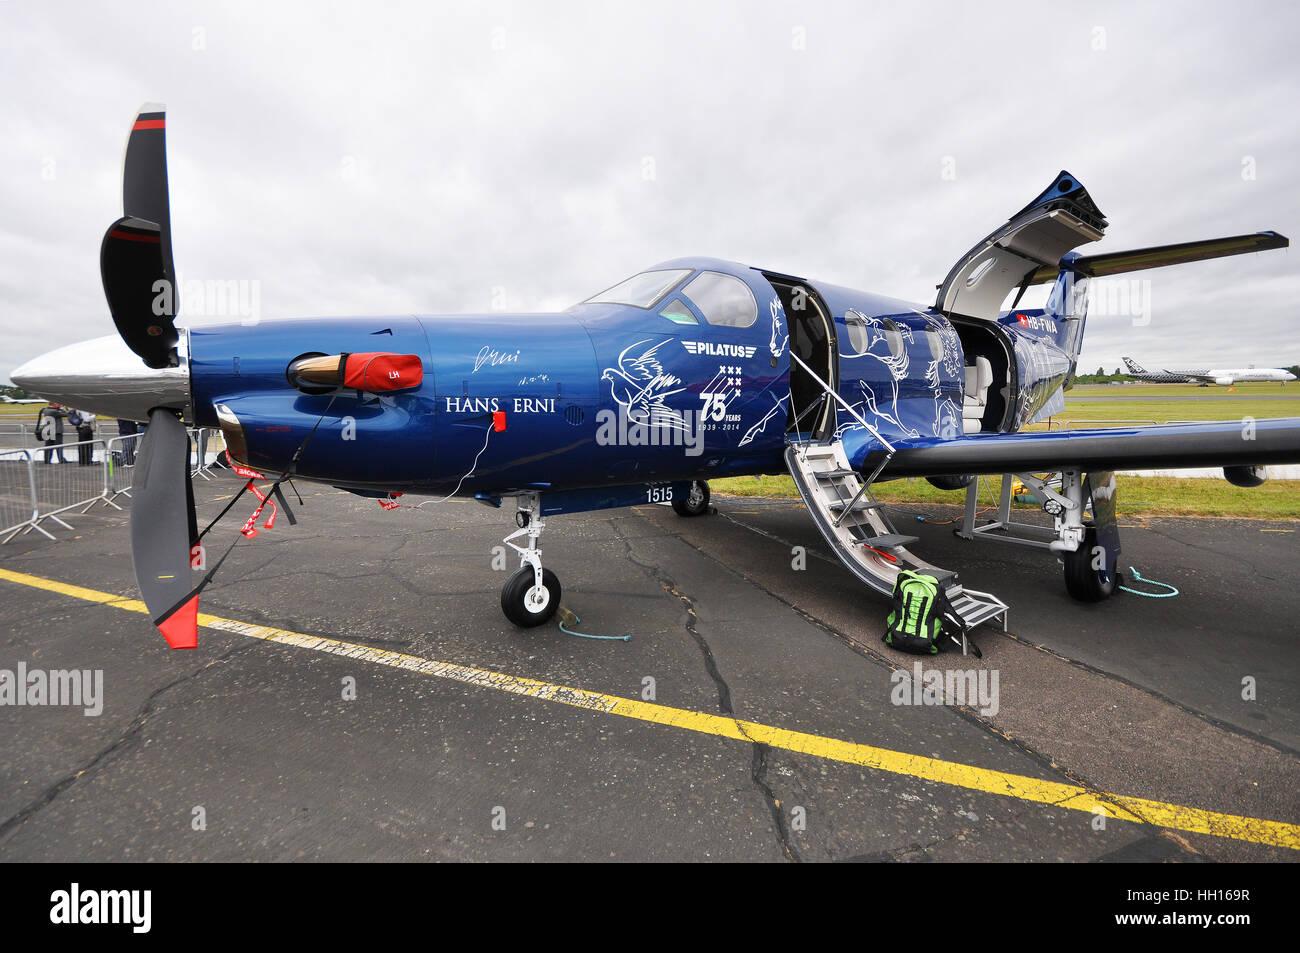 Plane & Pilot Buyer's Guide: Single-Engine Piston Planes - Plane & Pilot Magazine